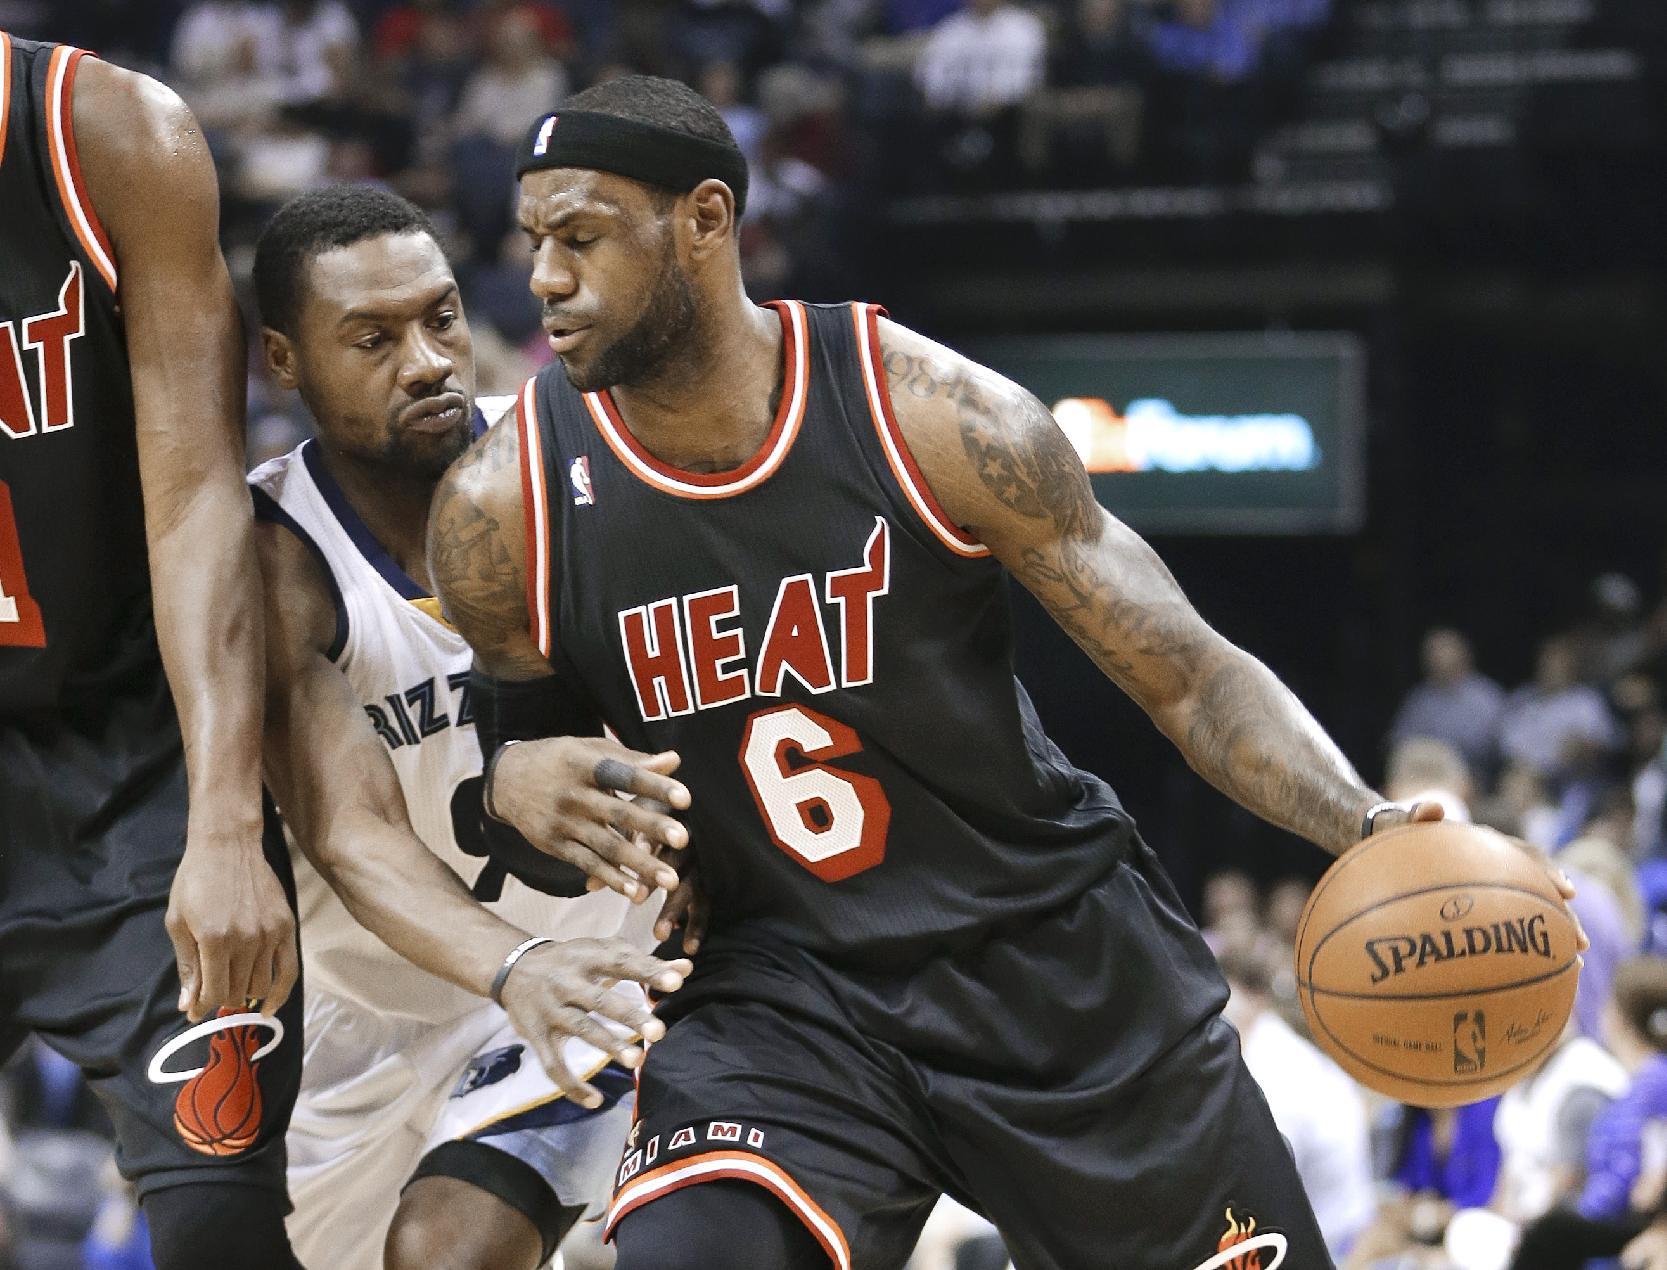 Miami Heat forward LeBron James (6) drives around Memphis Grizzlies guard Tony Allen (9) in the first half of an NBA basketball game Wednesday, April 9, 2014, in Memphis, Tenn